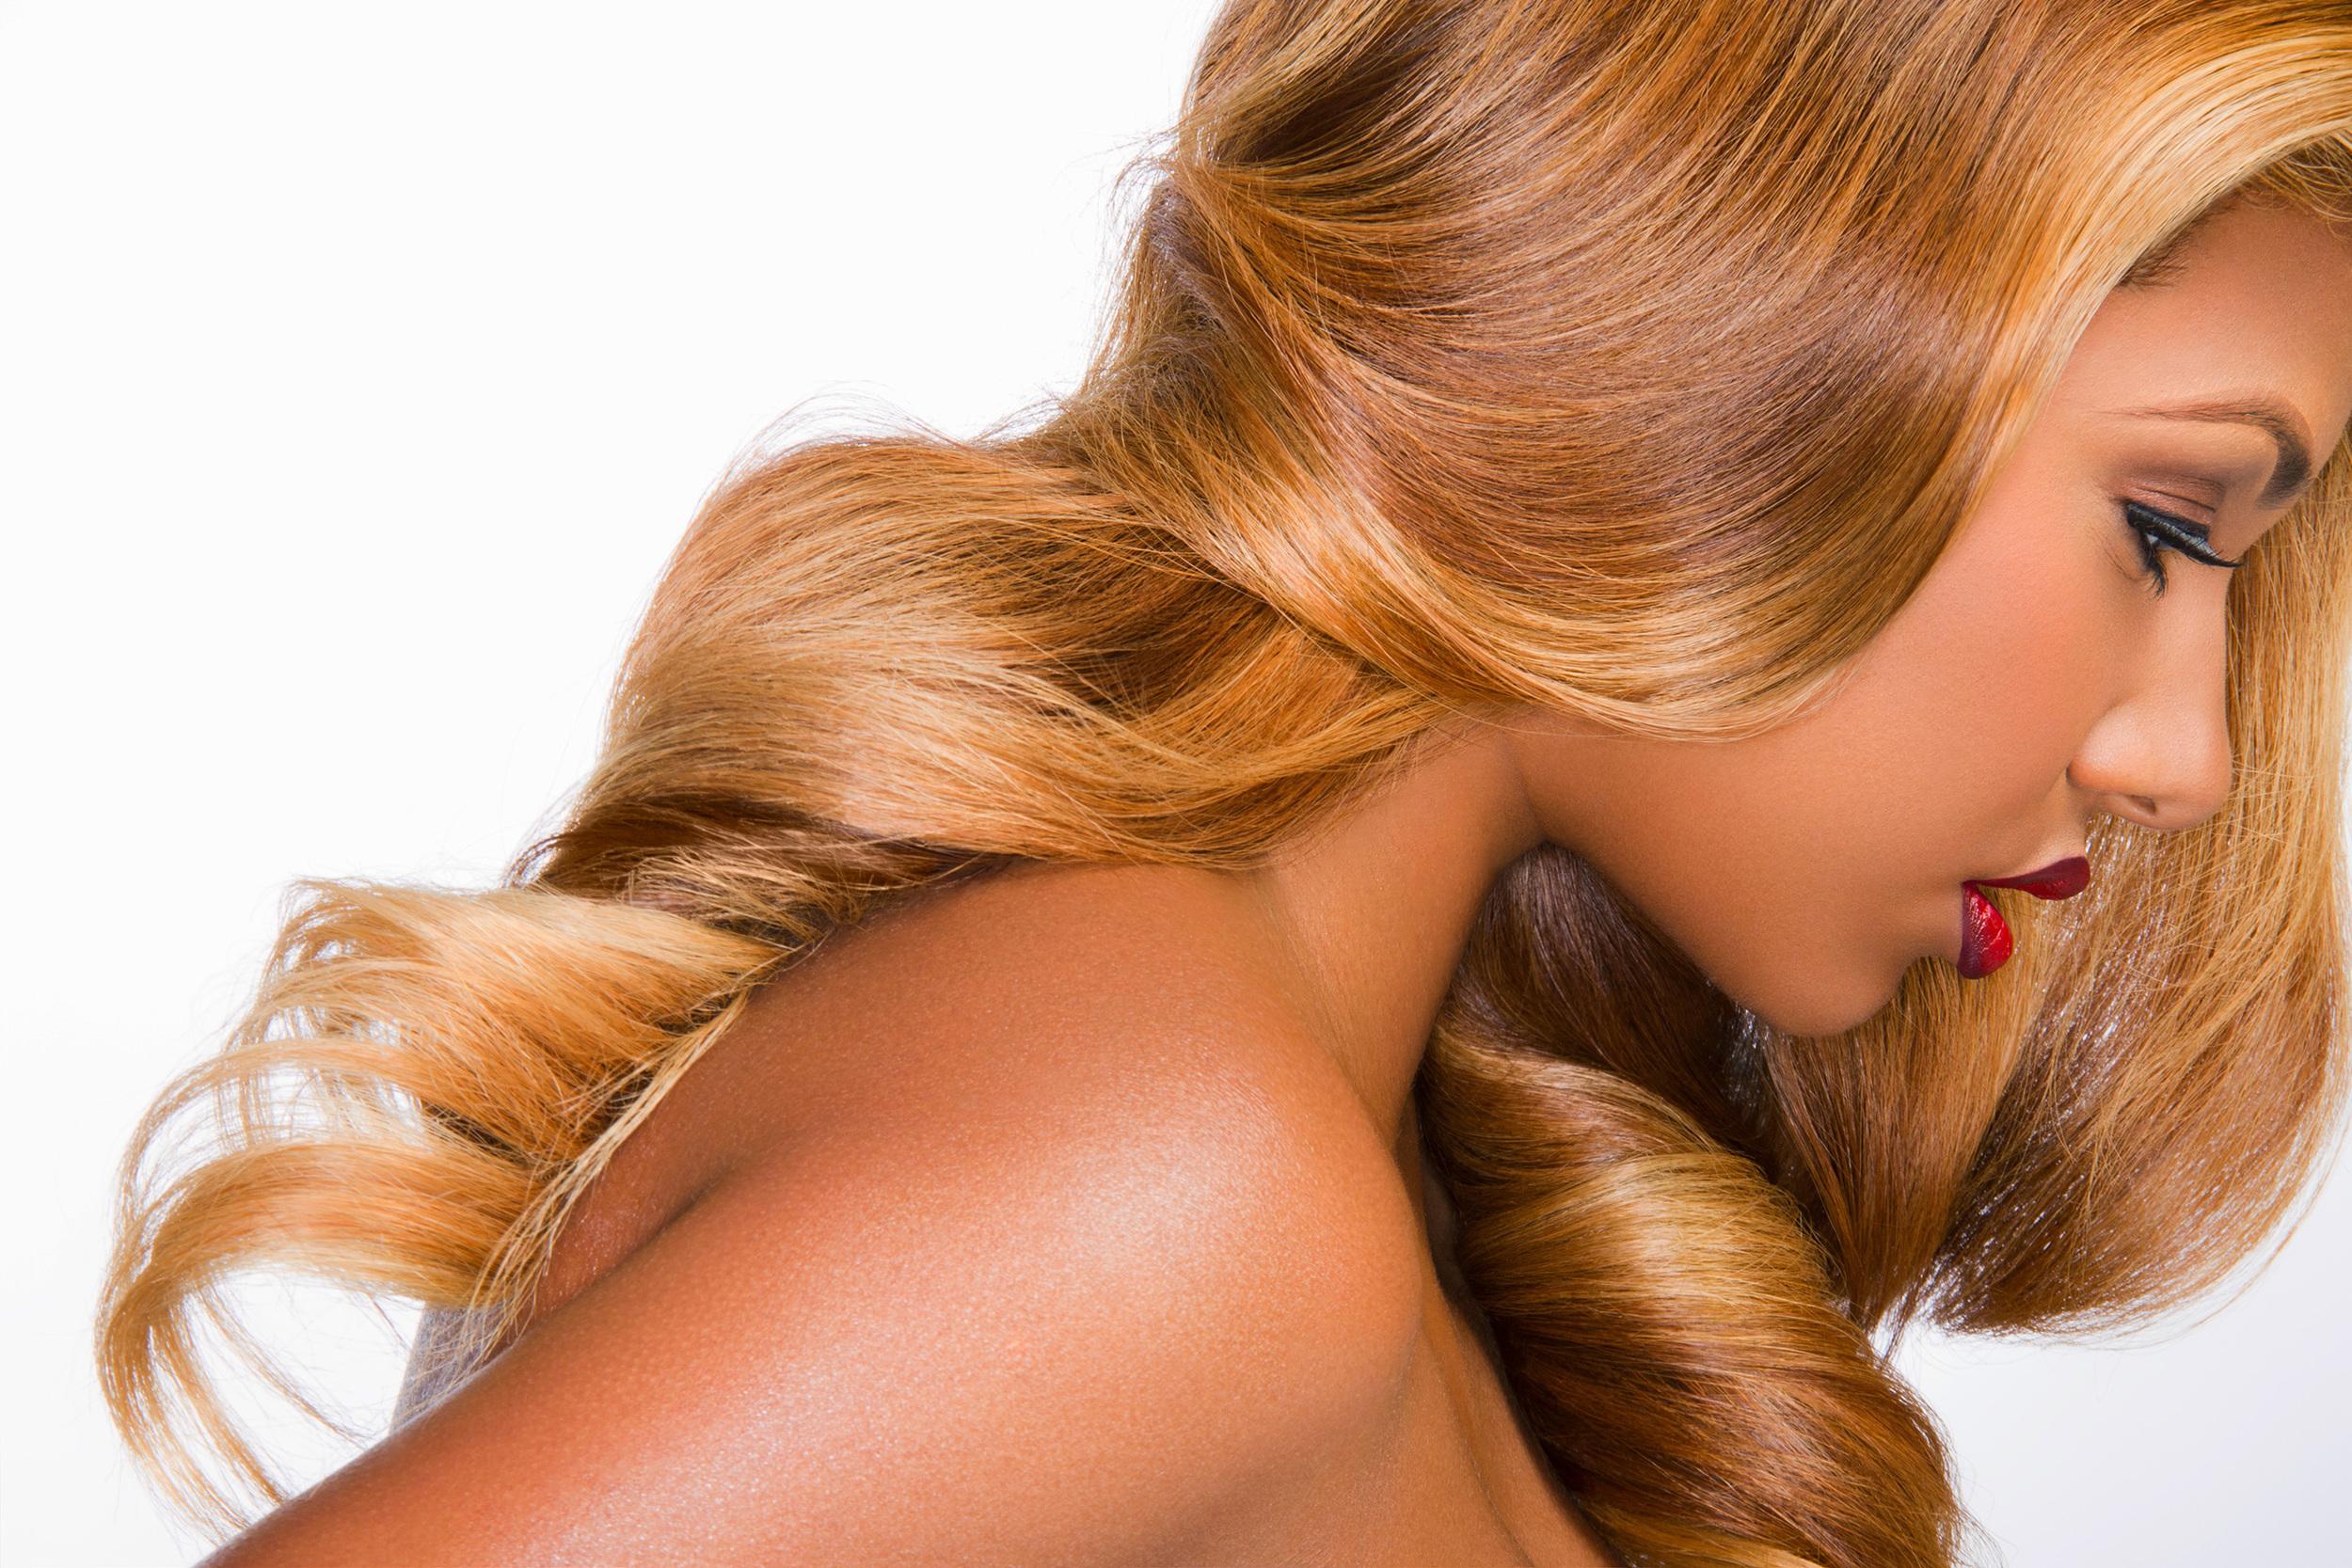 blonde hair profile pic.jpg